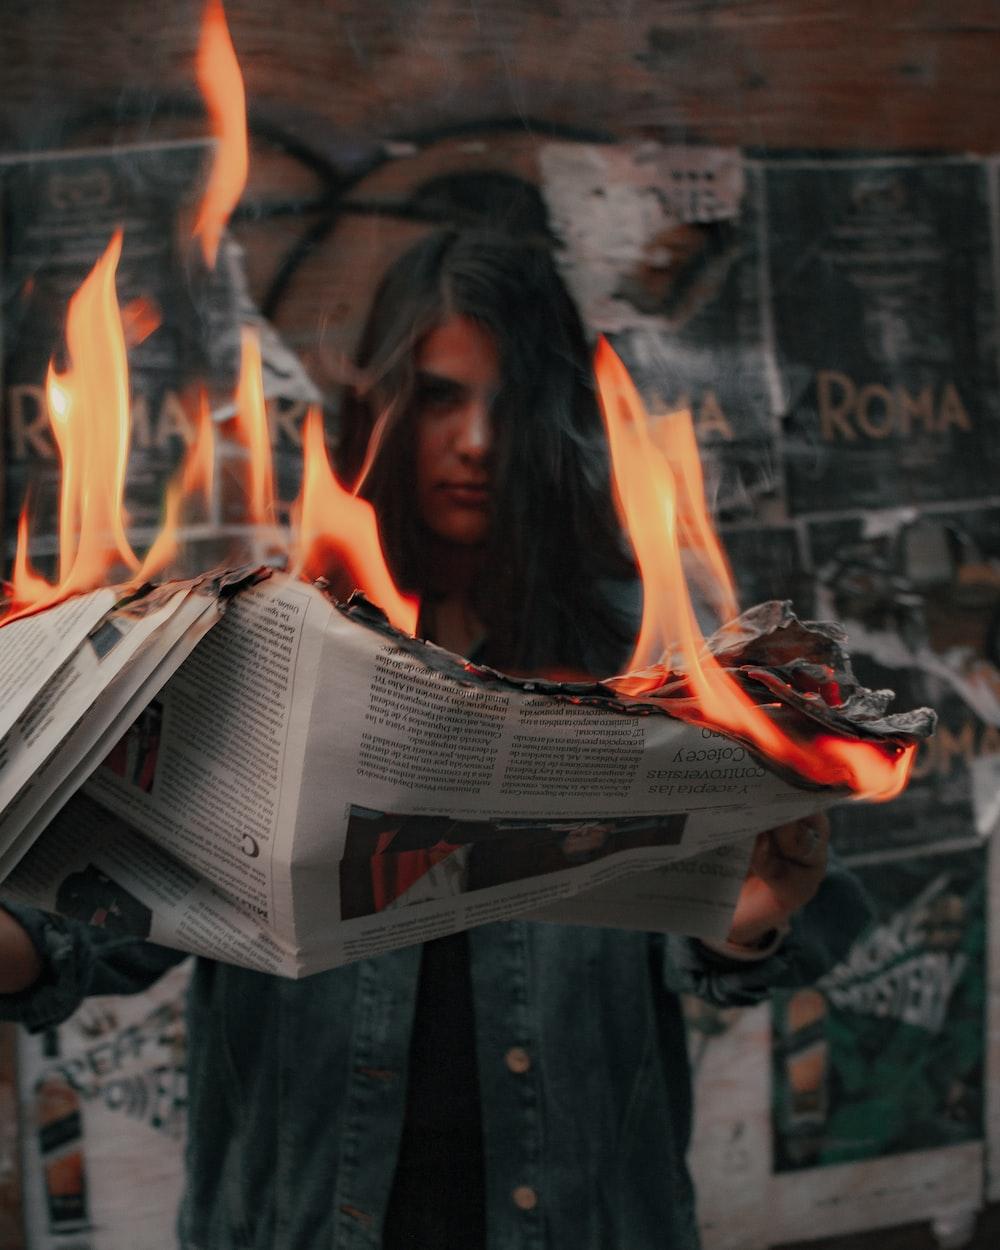 woman in black jacket holding newspaper